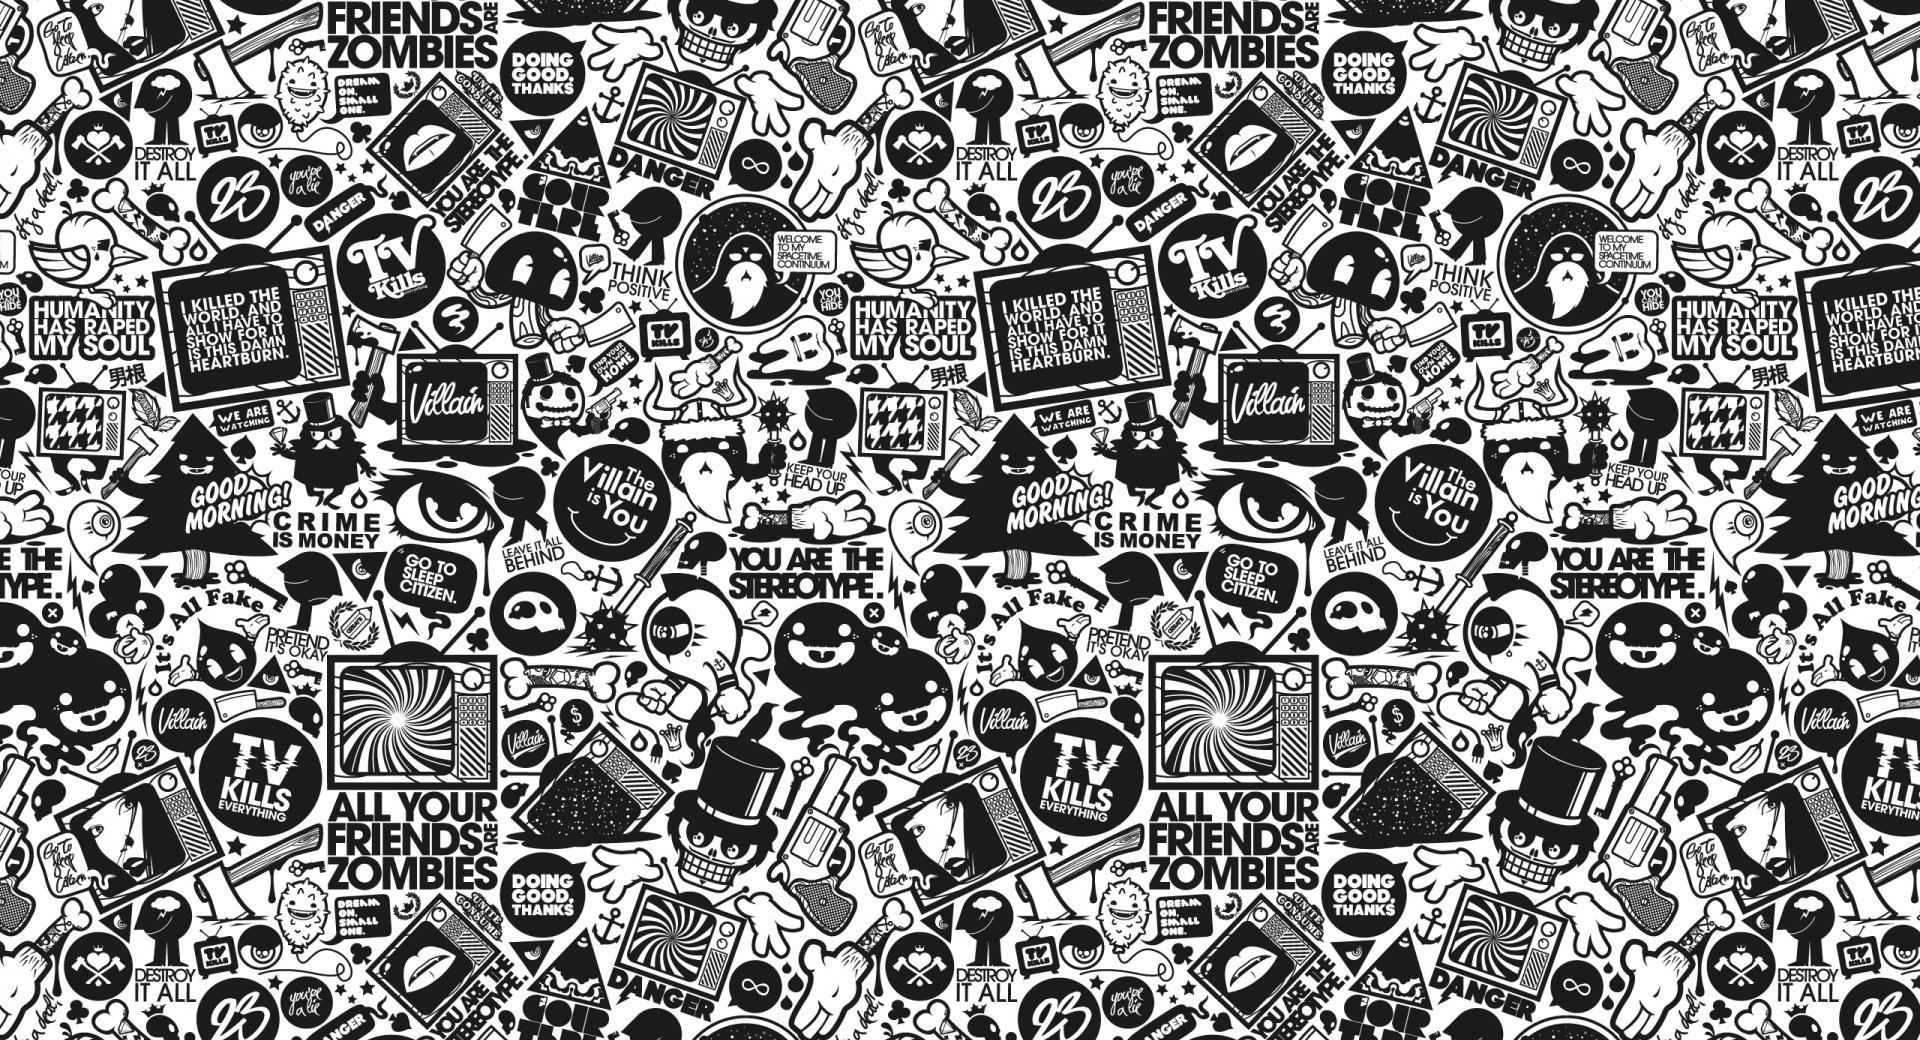 Villain Characters Cartoon wallpapers HD quality